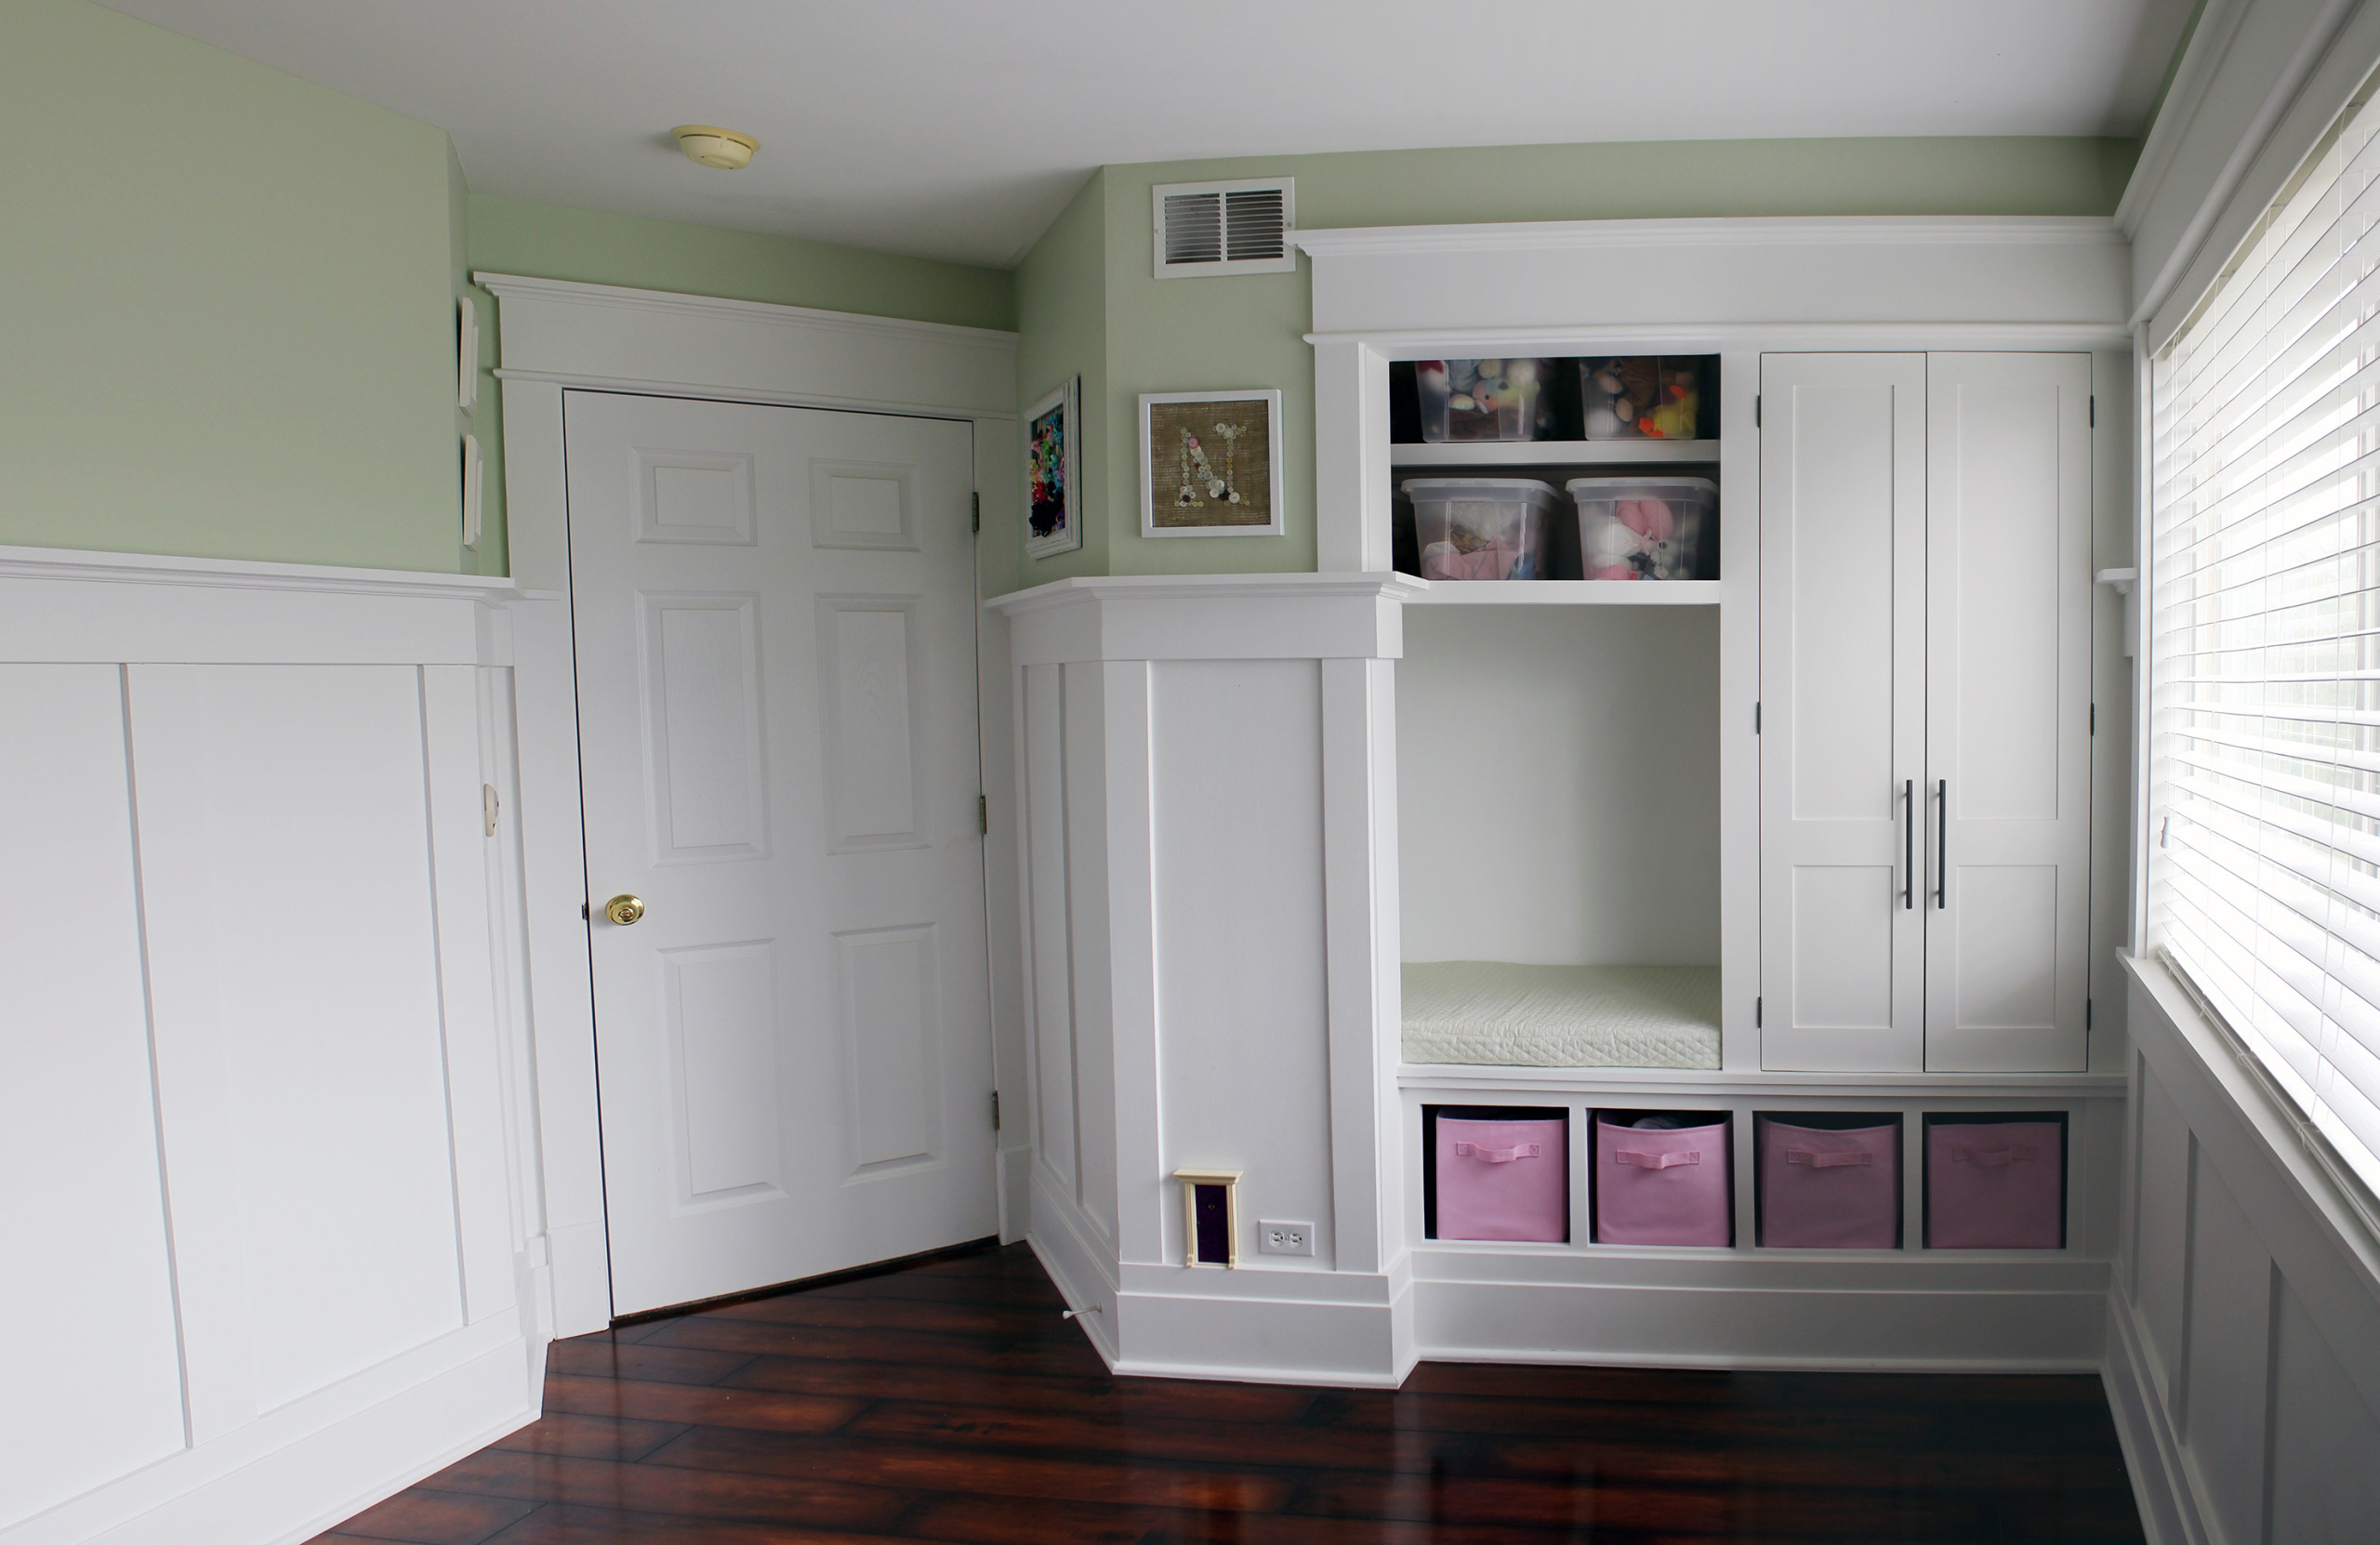 75 Beautiful Craftsman Reach In Closet Pictures Ideas November 2020 Houzz